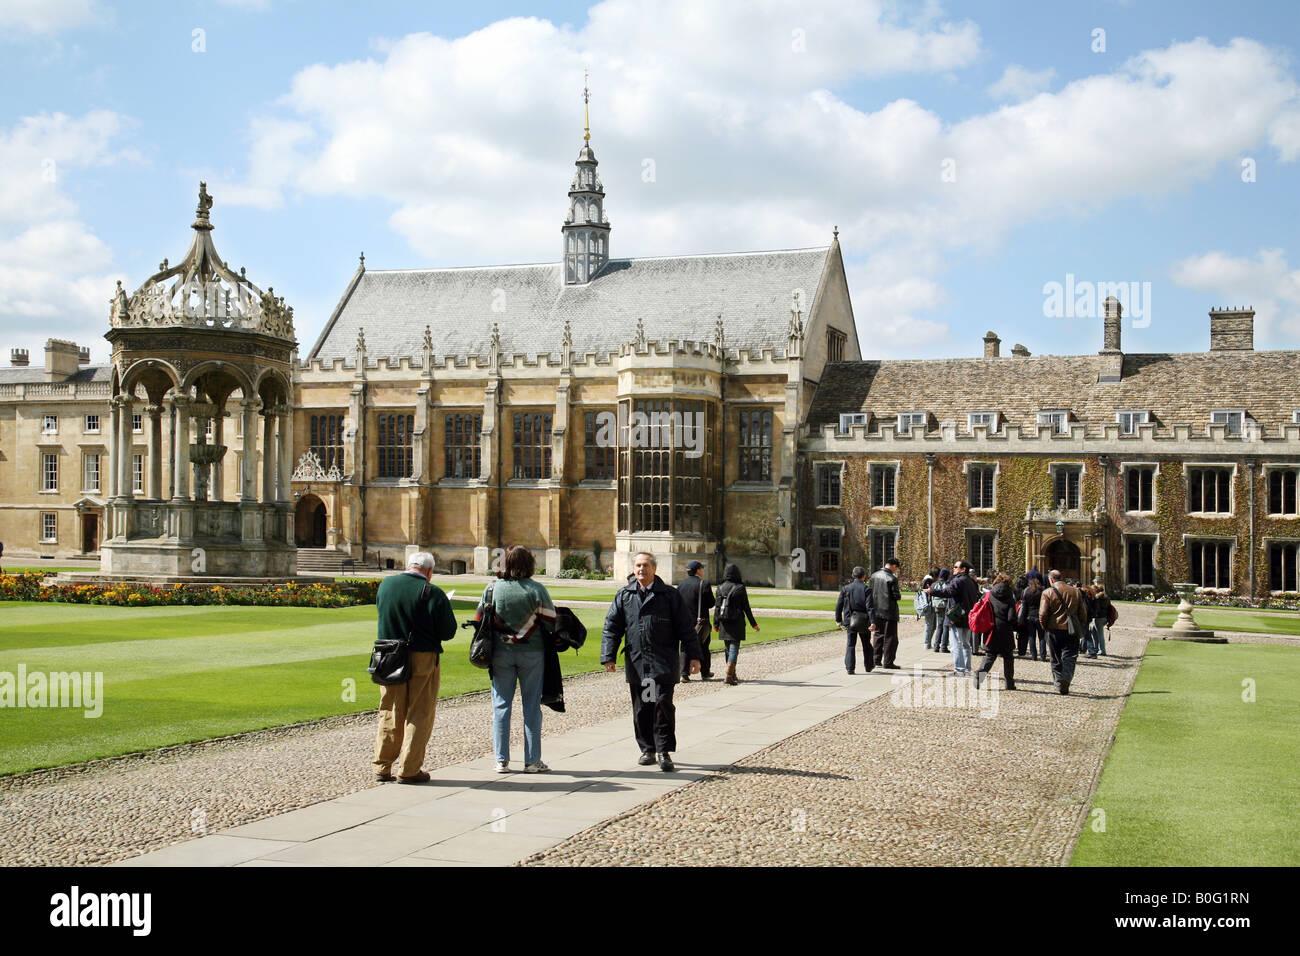 Cambridge University students and tourists in Great Court, Trinity College, Cambridge, UK - Stock Image